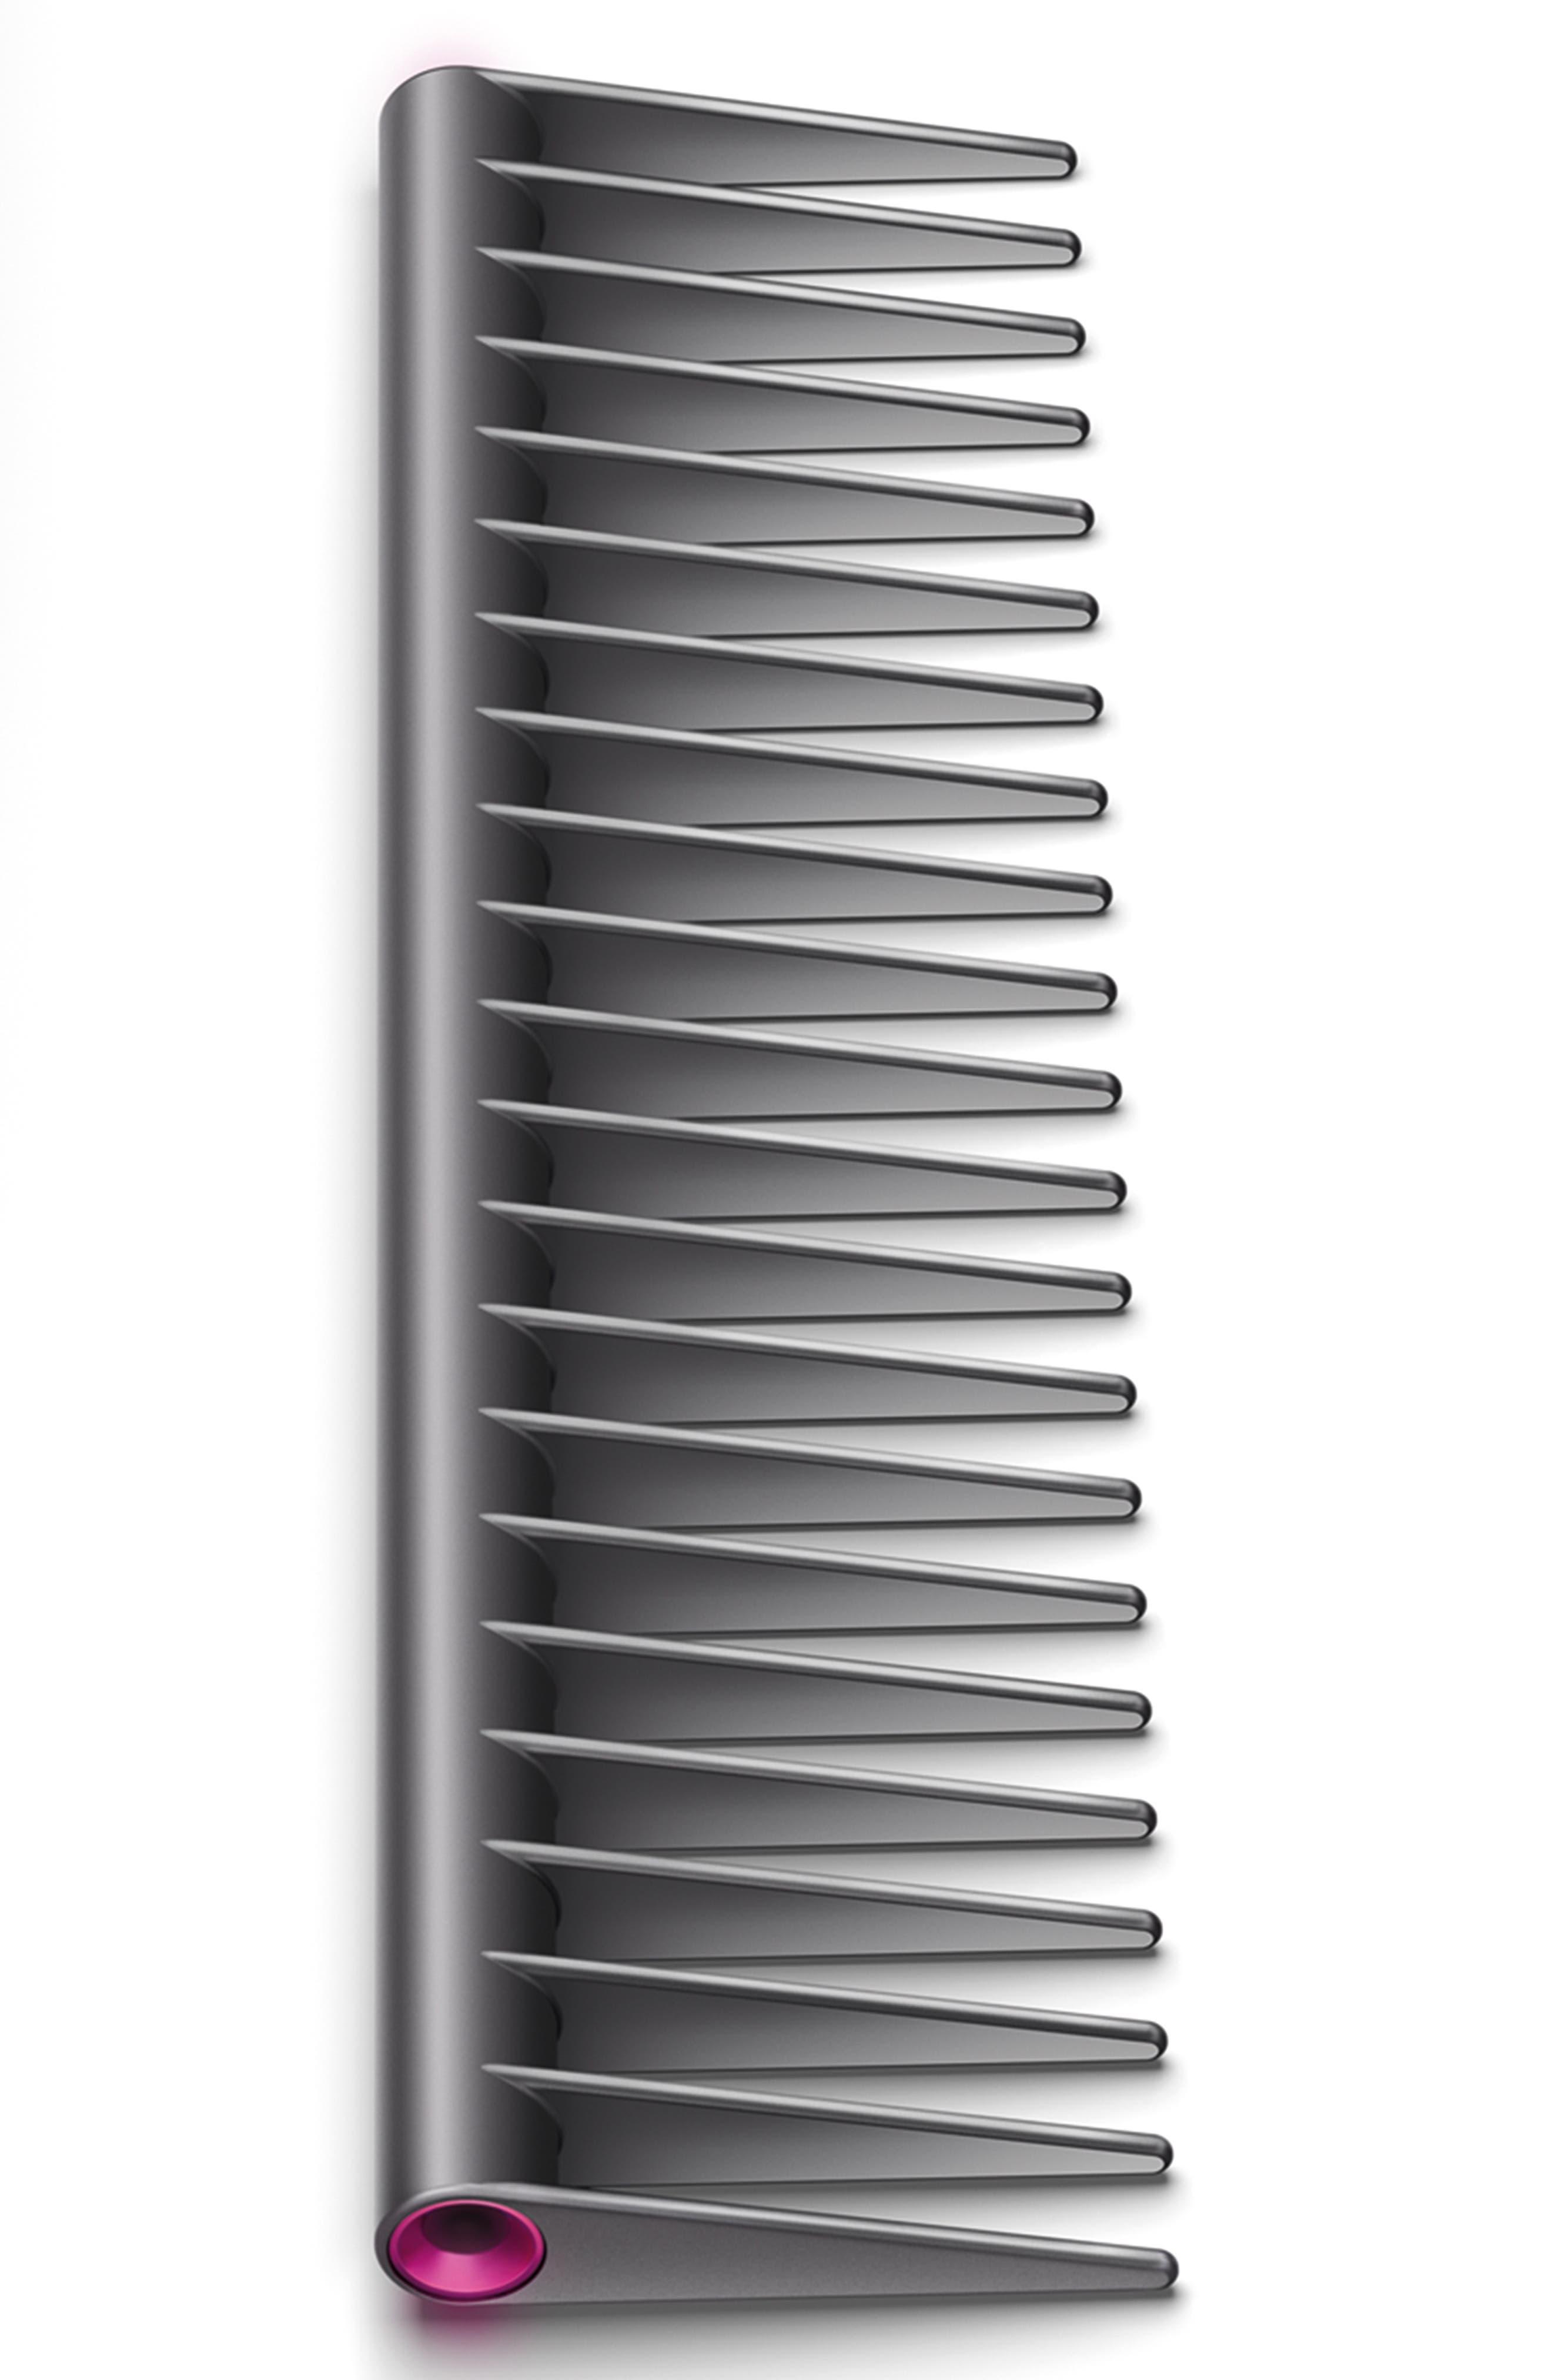 DYSON, Supersonic<sup>™</sup> Hair Dryer, Detangling Comb & Paddle Brush Set, Alternate thumbnail 4, color, NO COLOR